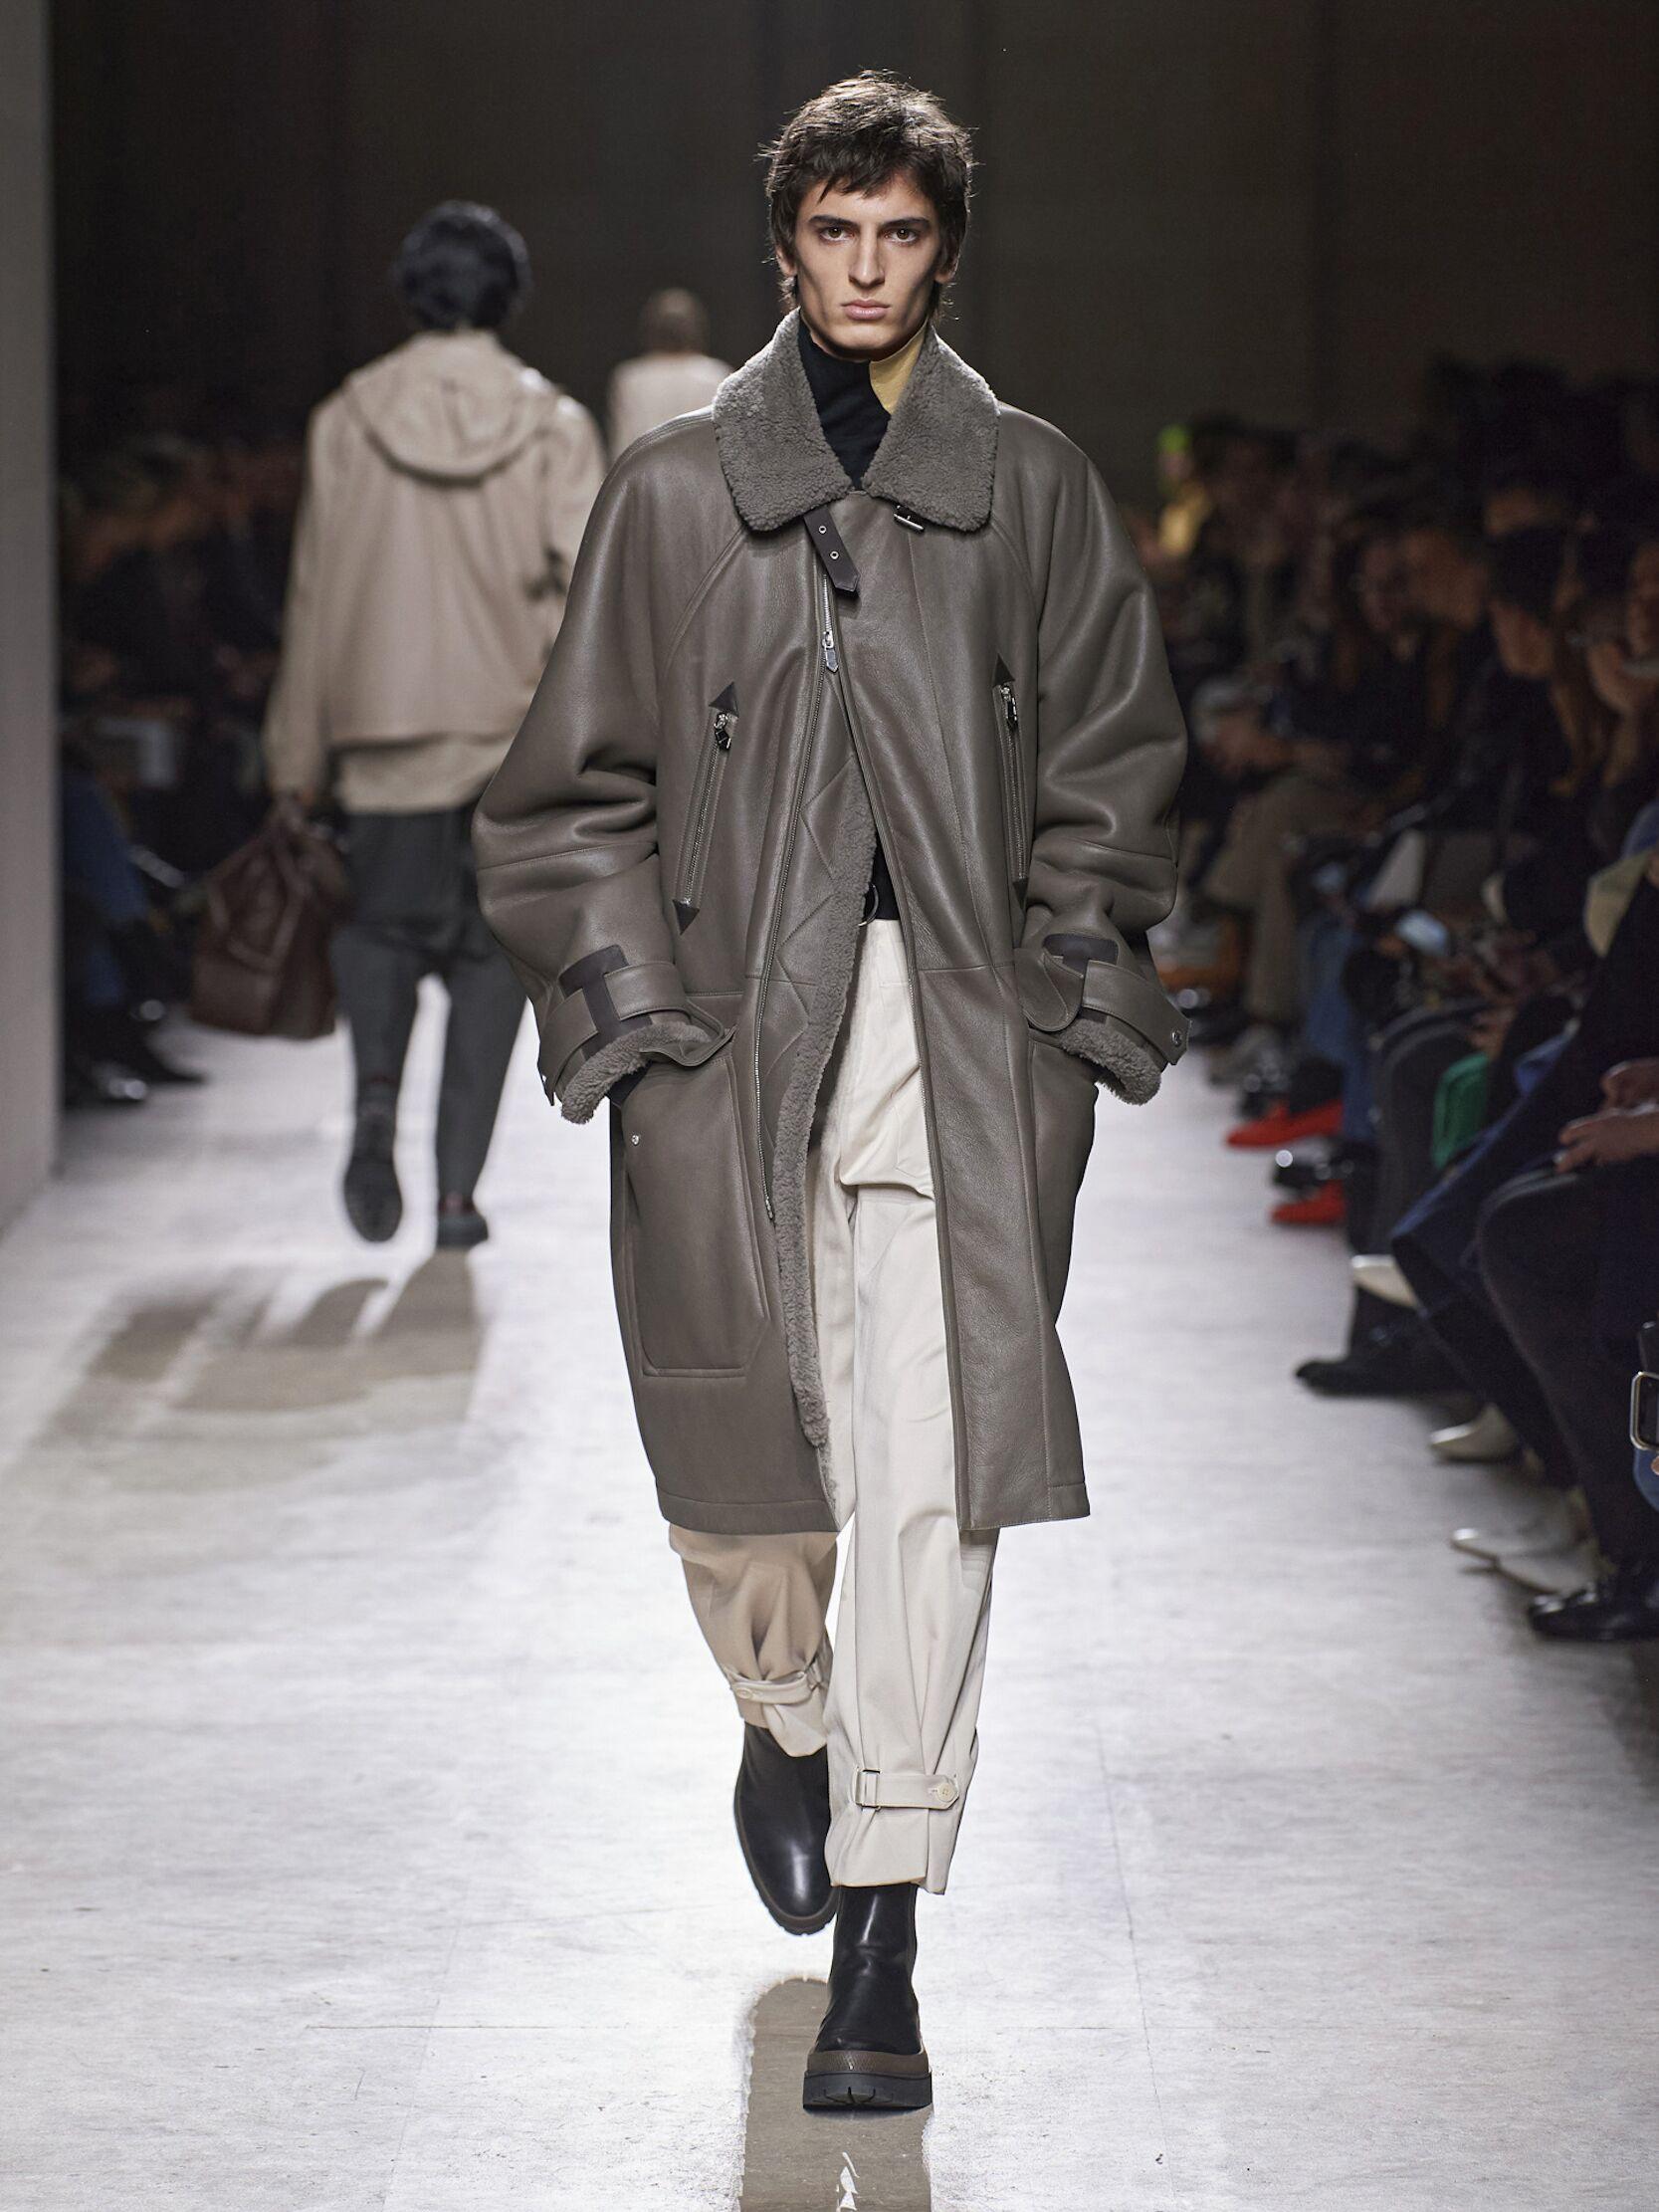 Hermès FW 2020 Menswear